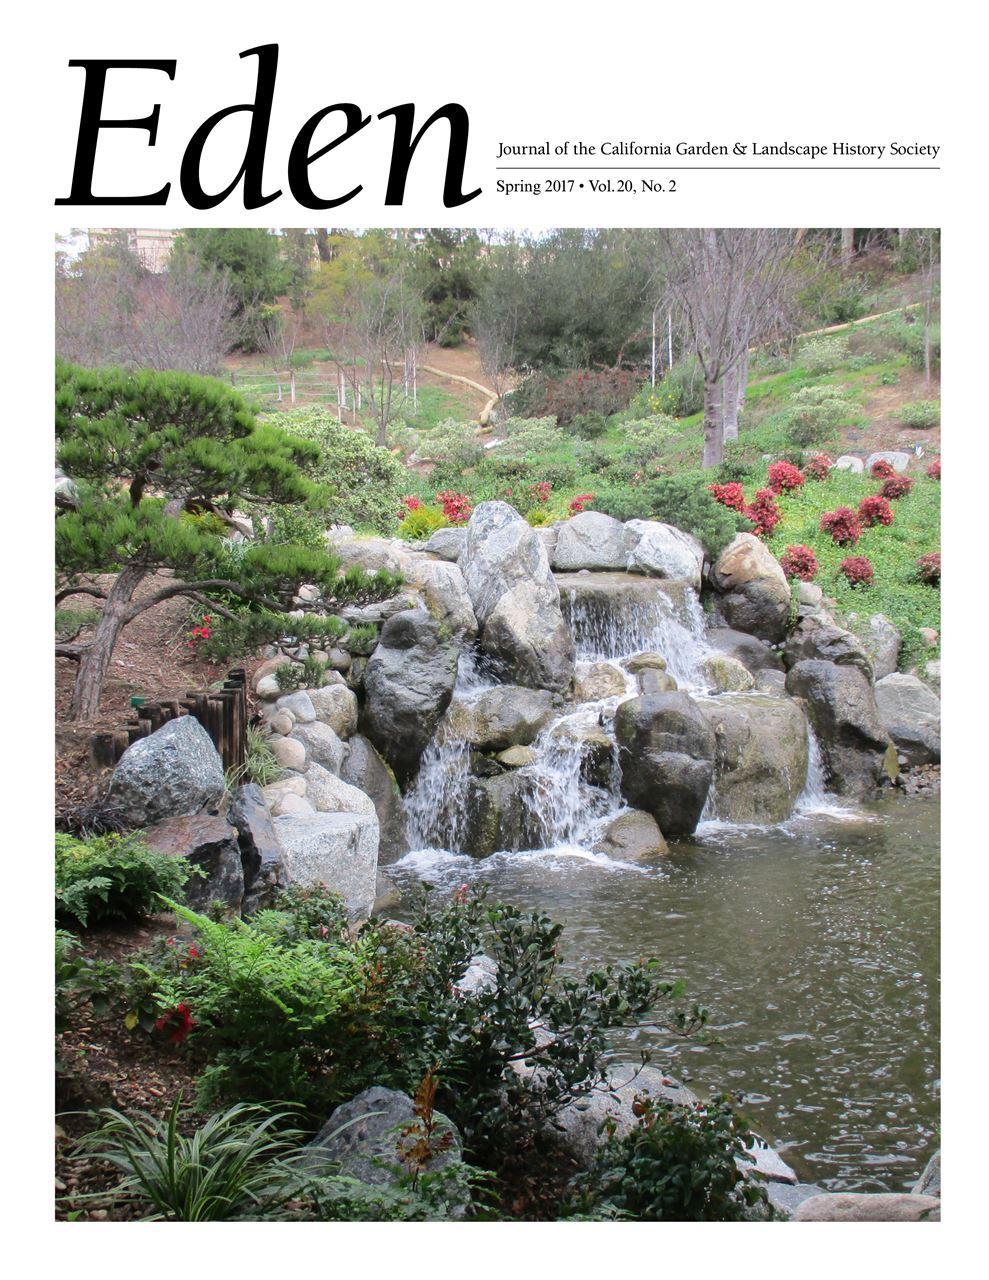 California Garden & Landscape History Society - Archives